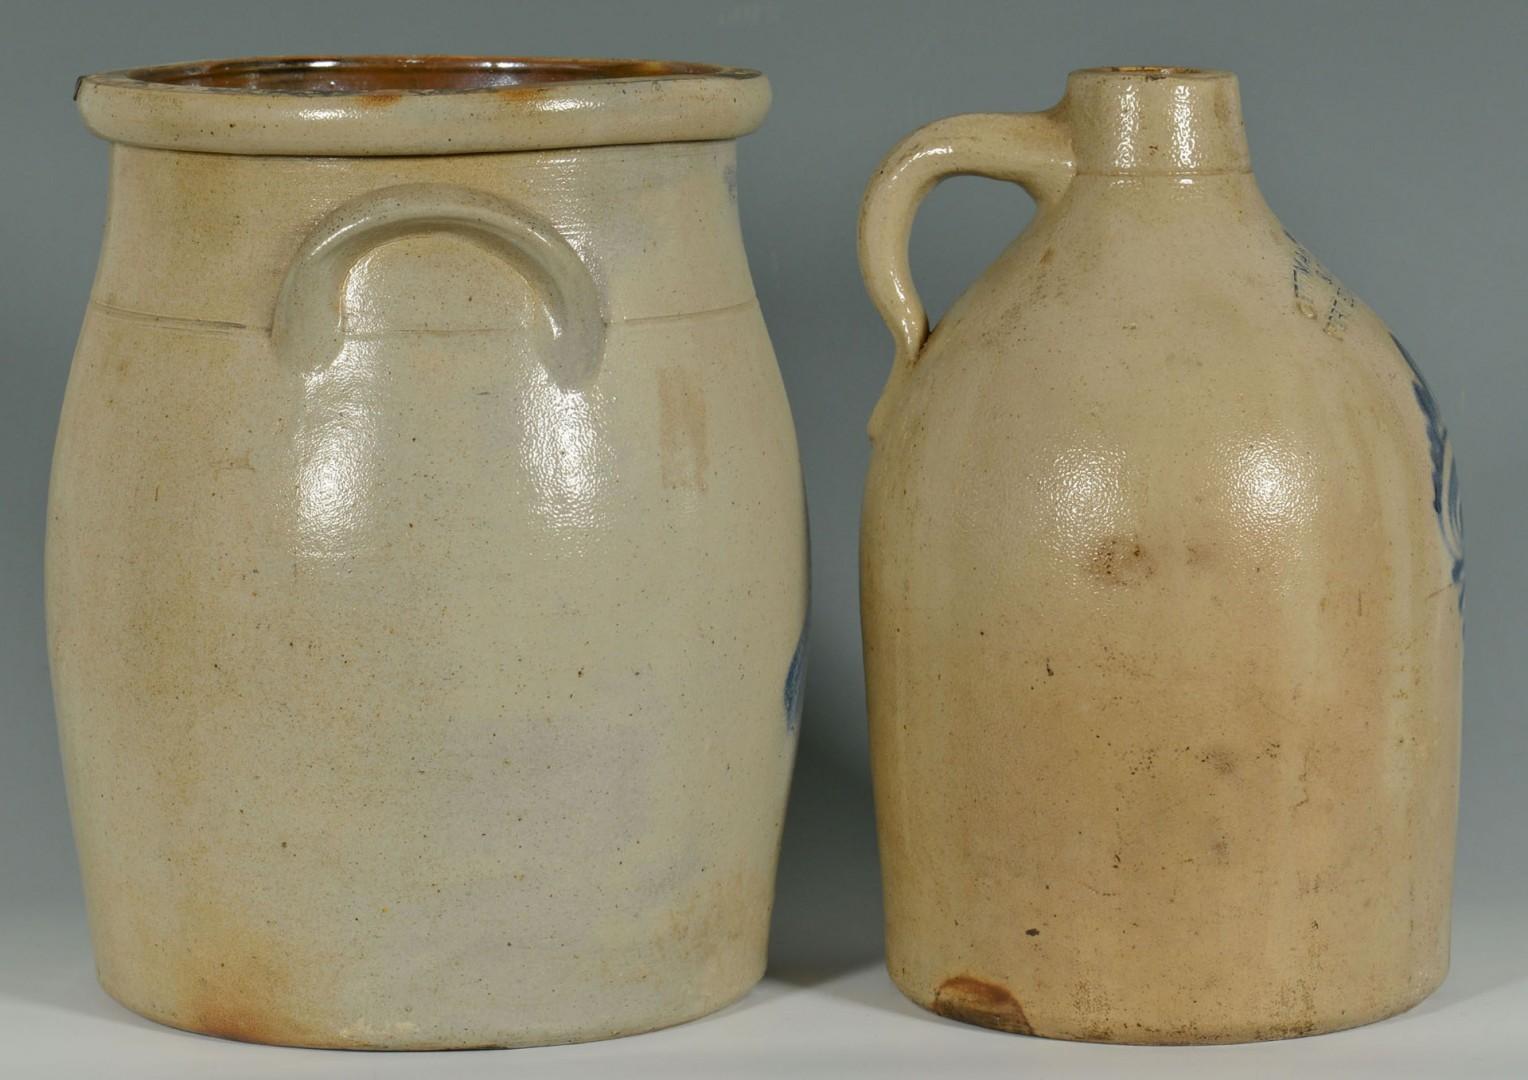 Cobalt Decorated Stoneware Jug and Jar, New England